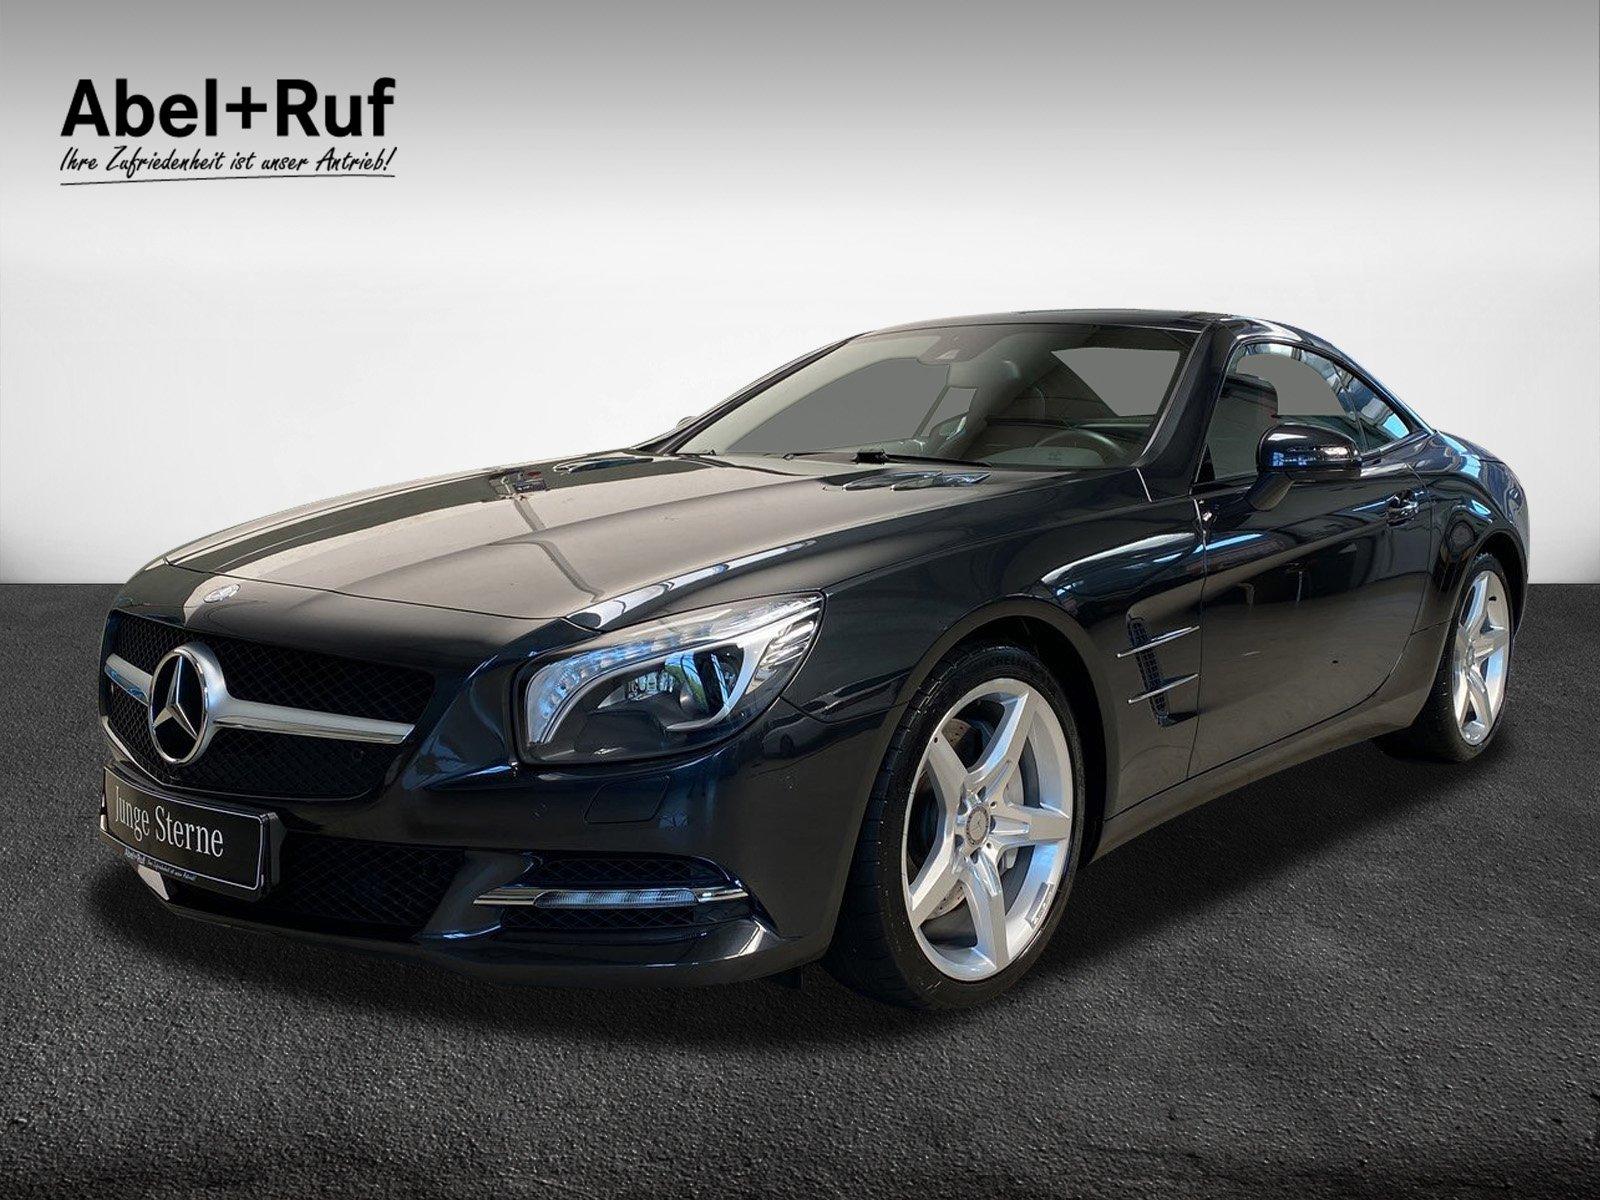 Mercedes-Benz SL 500 Comand+Sitz-Klima+ILS+HarmanKa+AMG-Felgen, Jahr 2012, Benzin